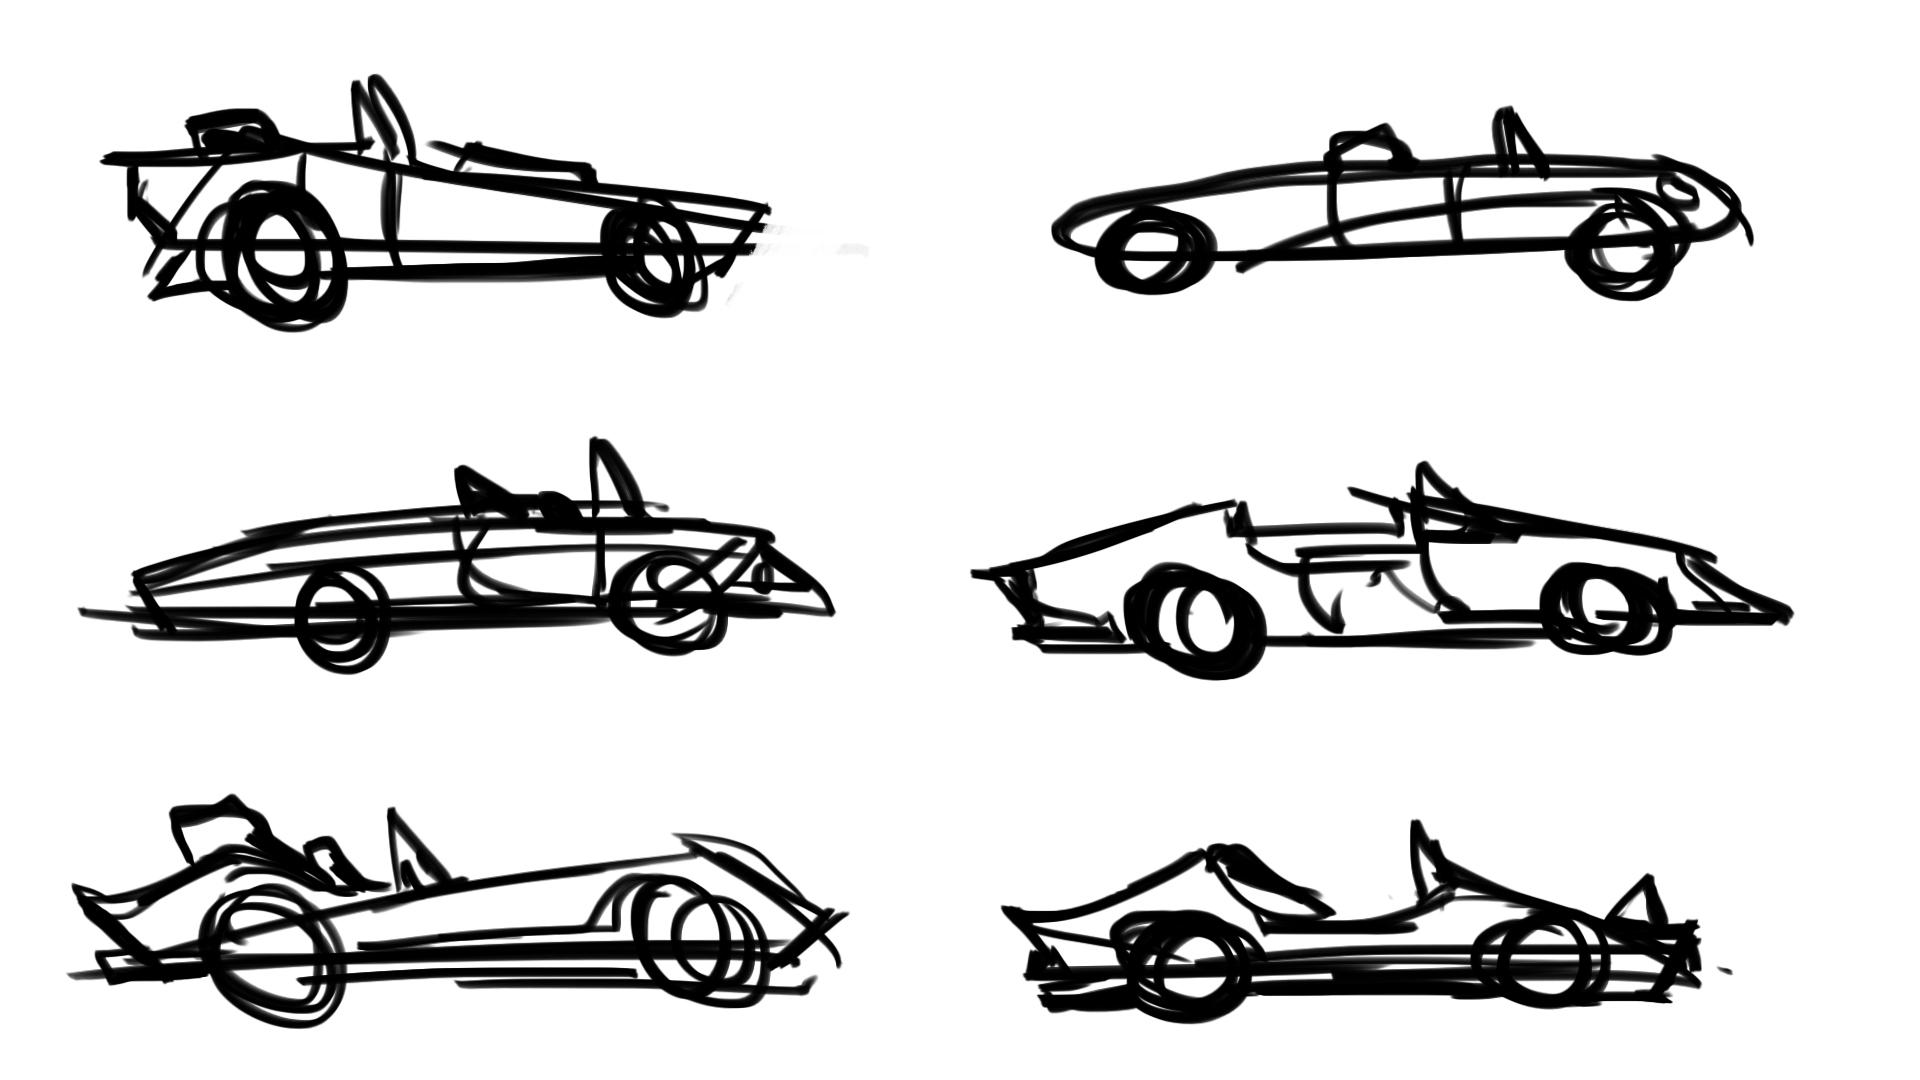 Oreo_sketch_car02.jpg